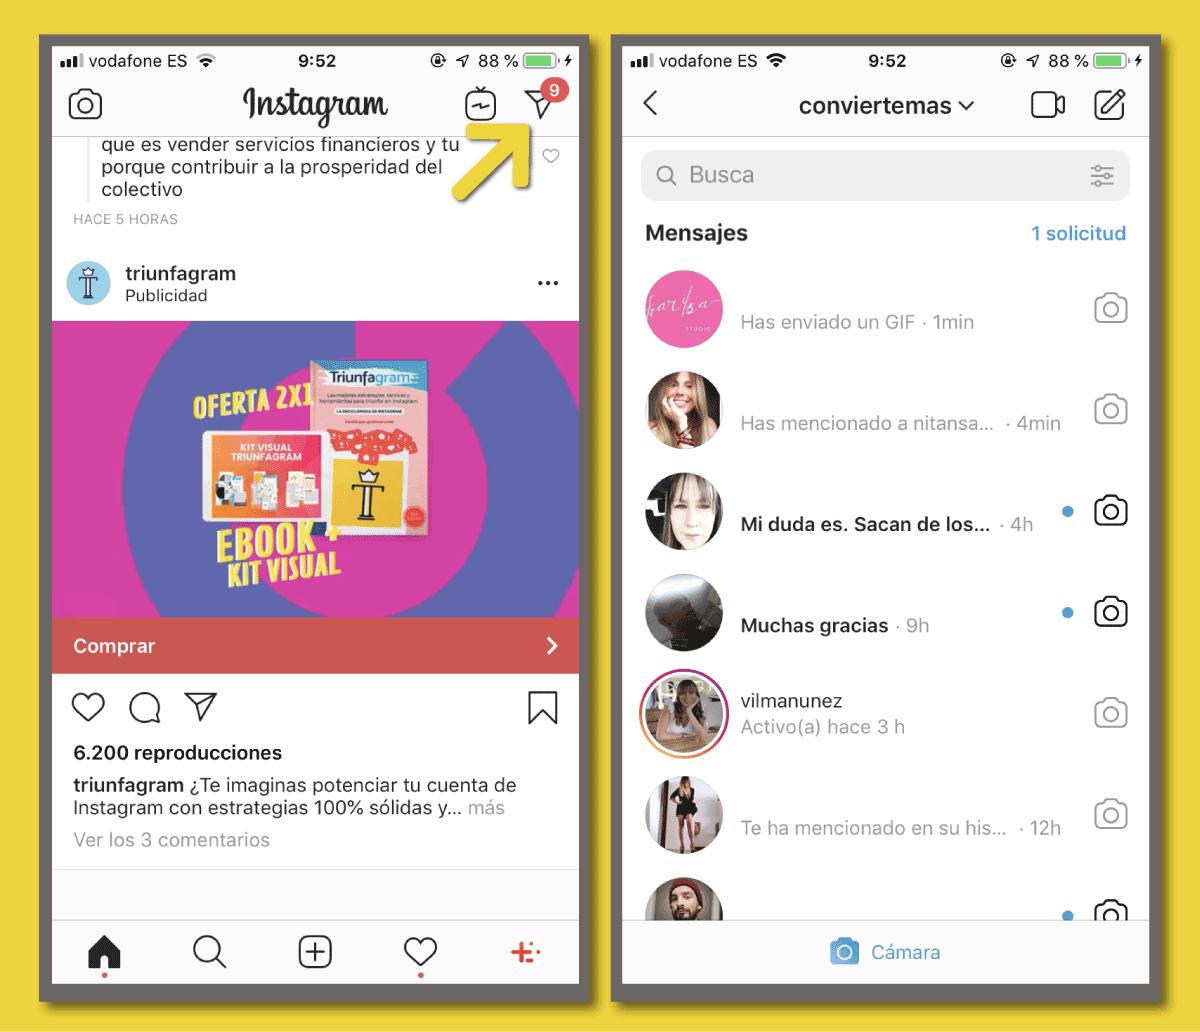 mensajes directos en Instagram